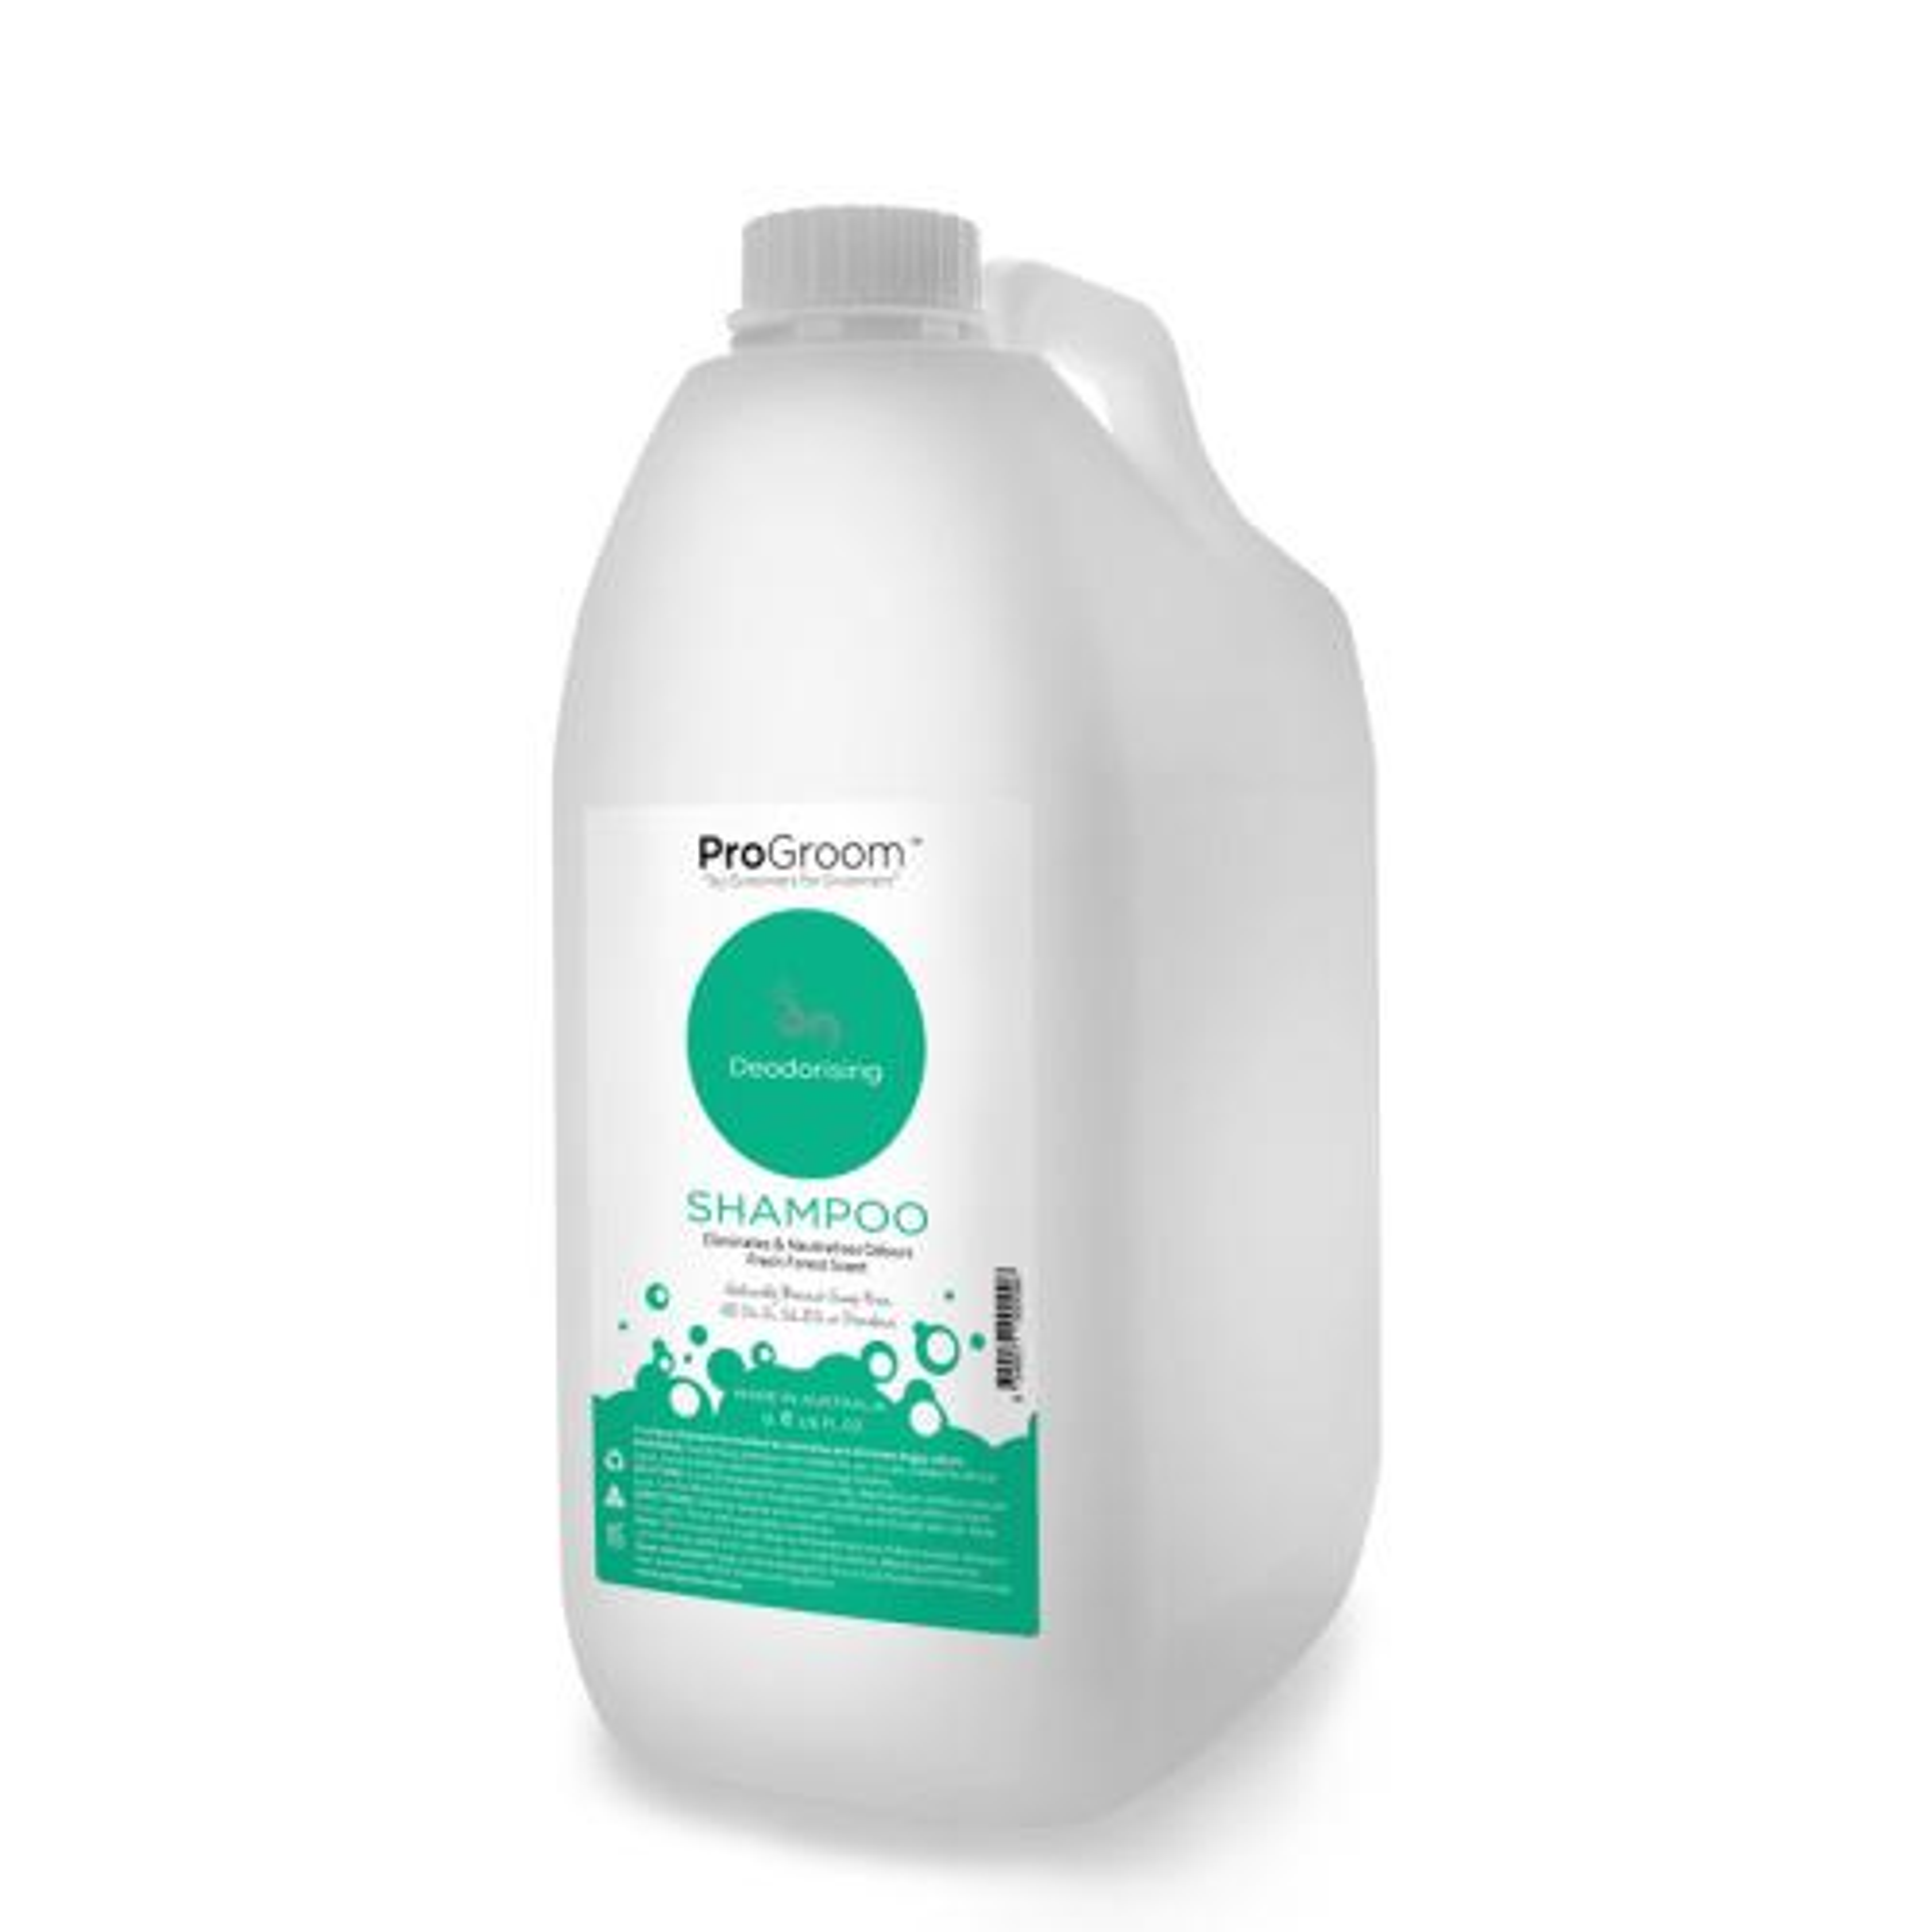 ProGroom Deodorising Shampoo - Jade 5 Litre